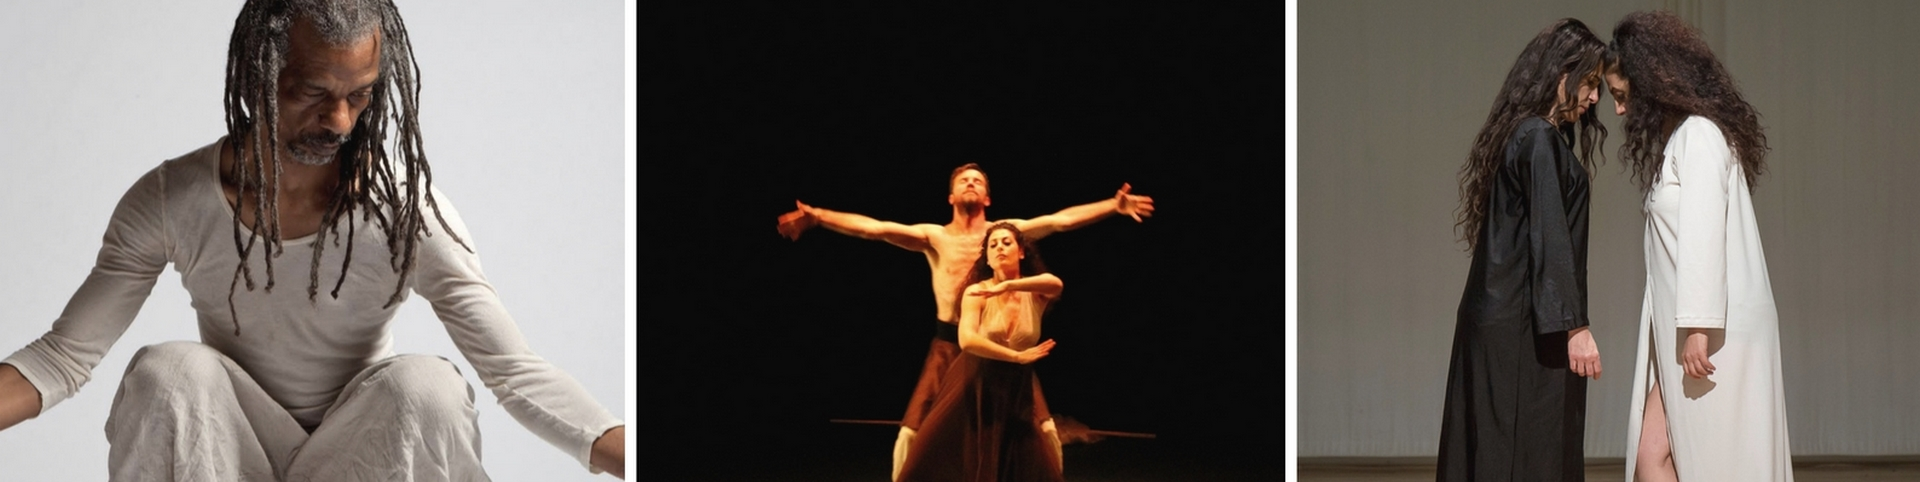 Jasadân au Festival 360° de Danse – Paris 15e